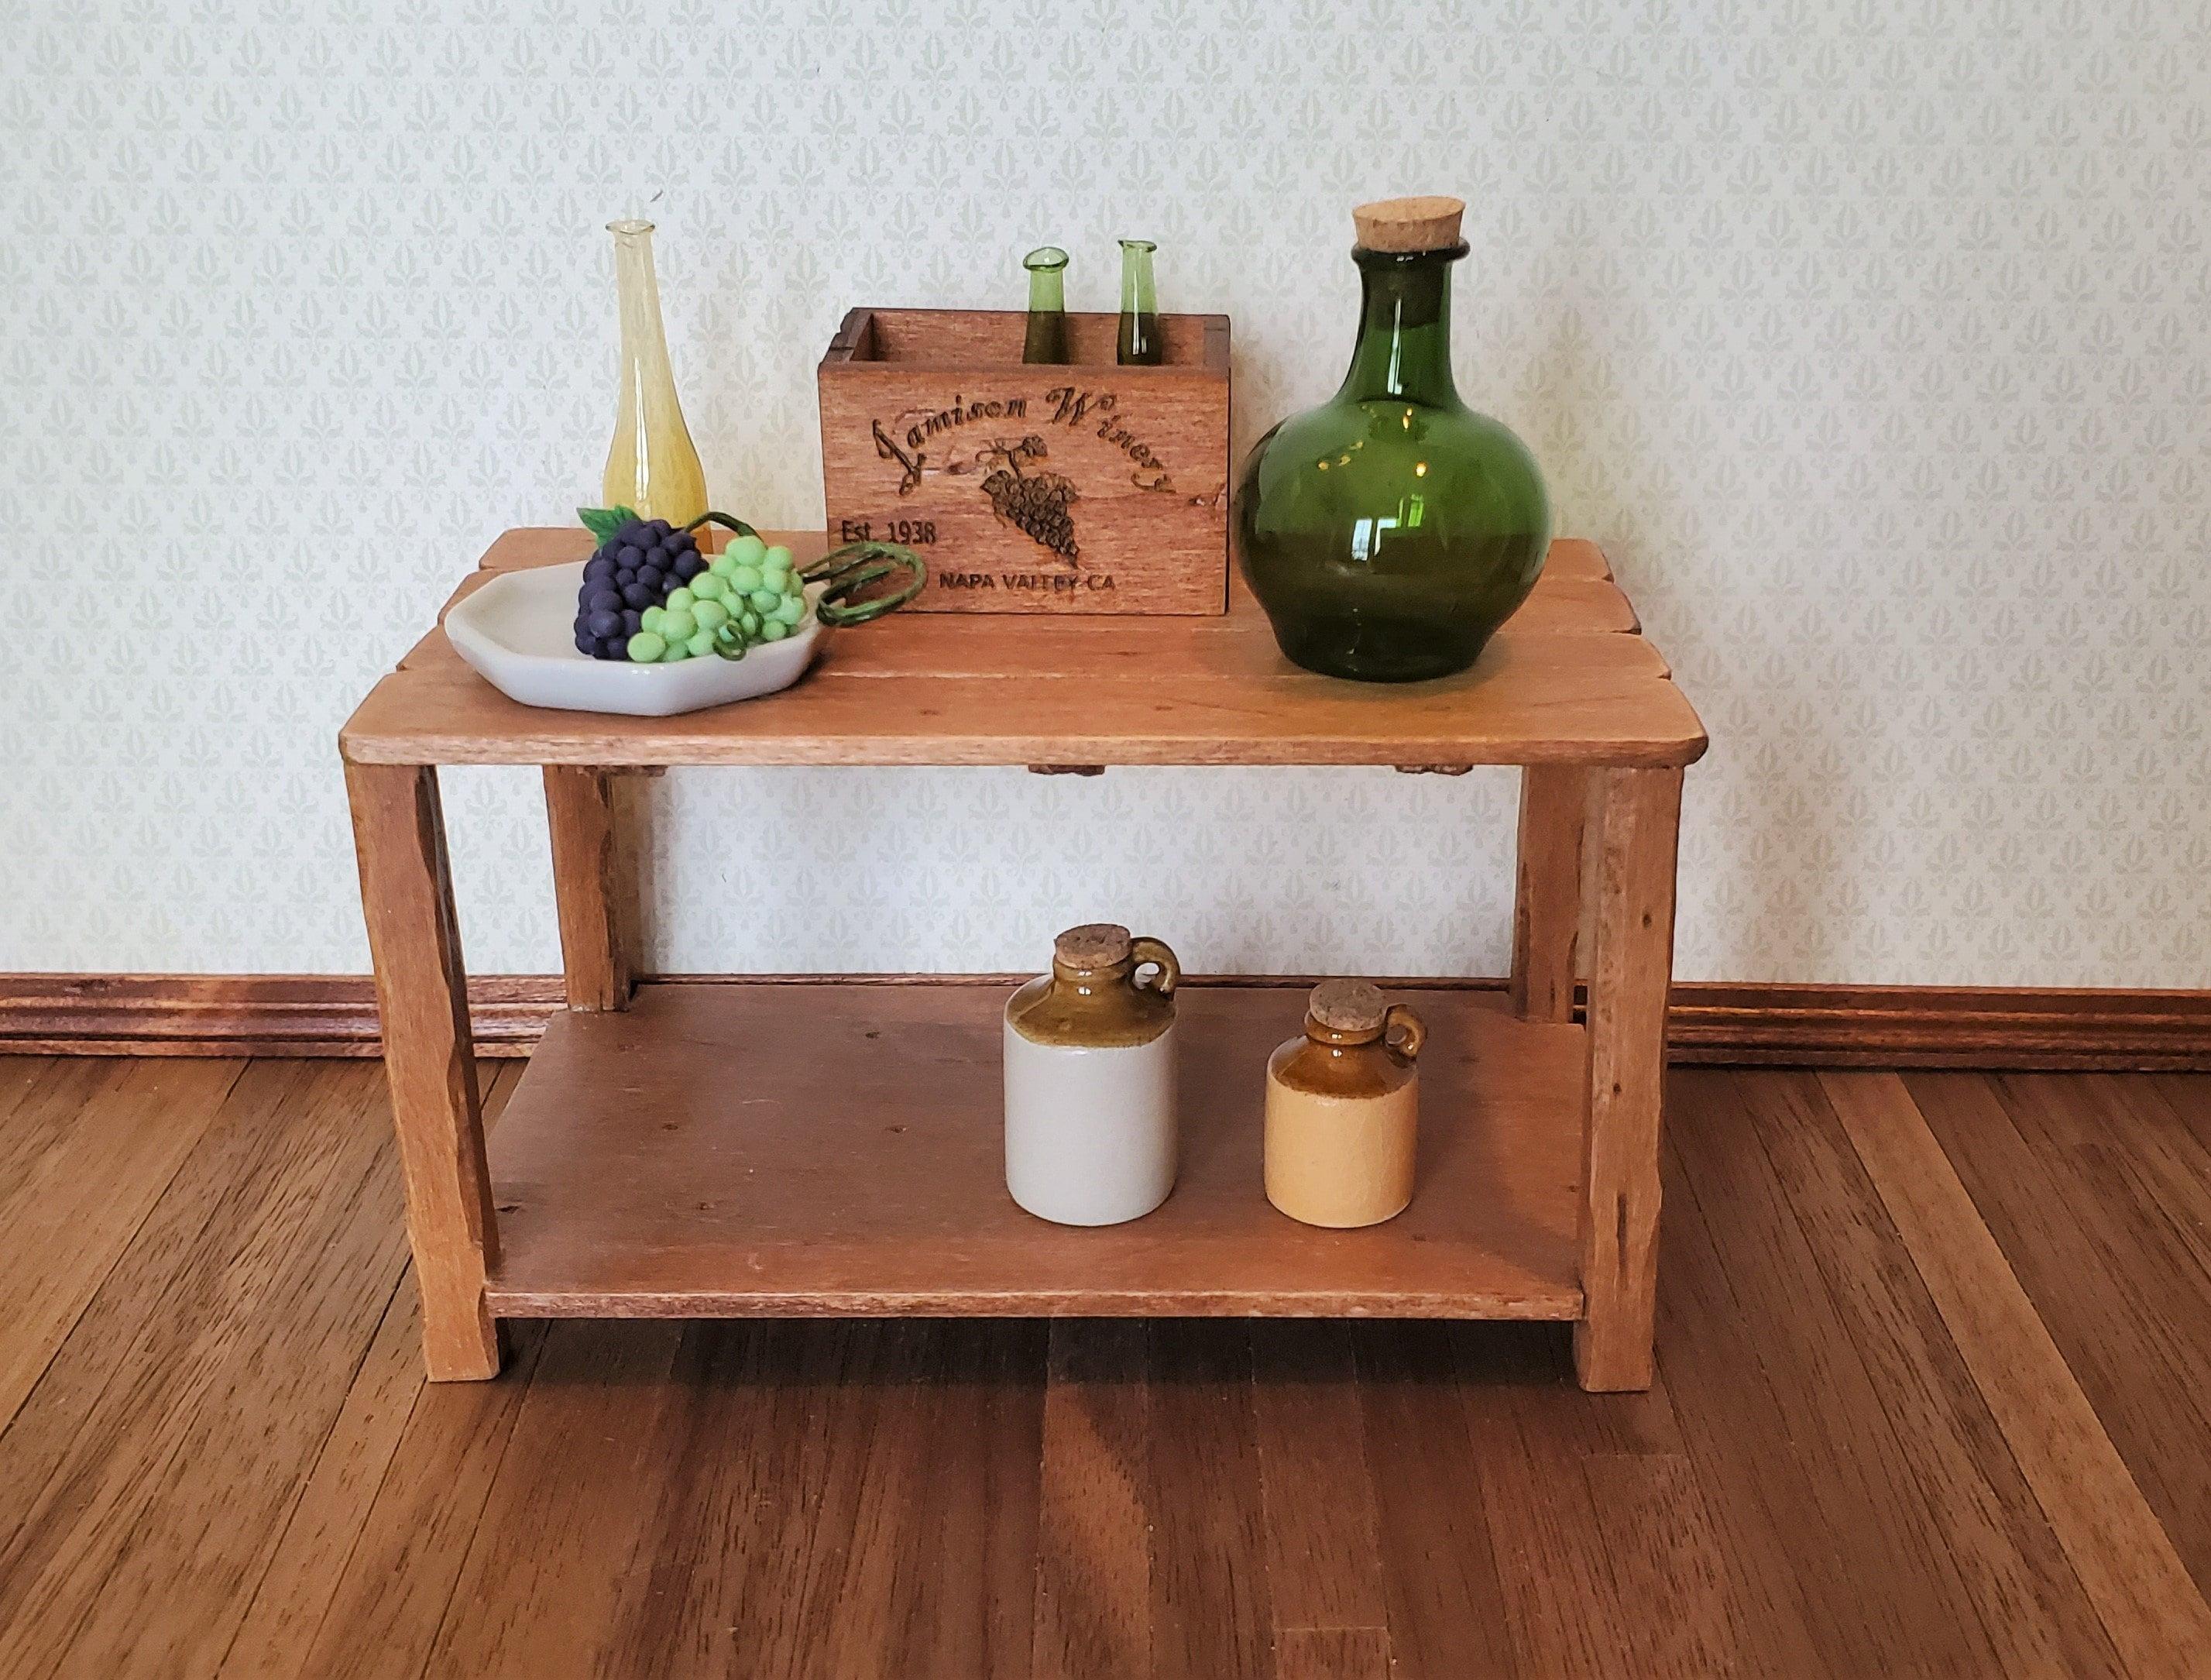 Dollhouse Miniature Wine Crate Jamison Winery Napa Valley Vintage Style 1:12